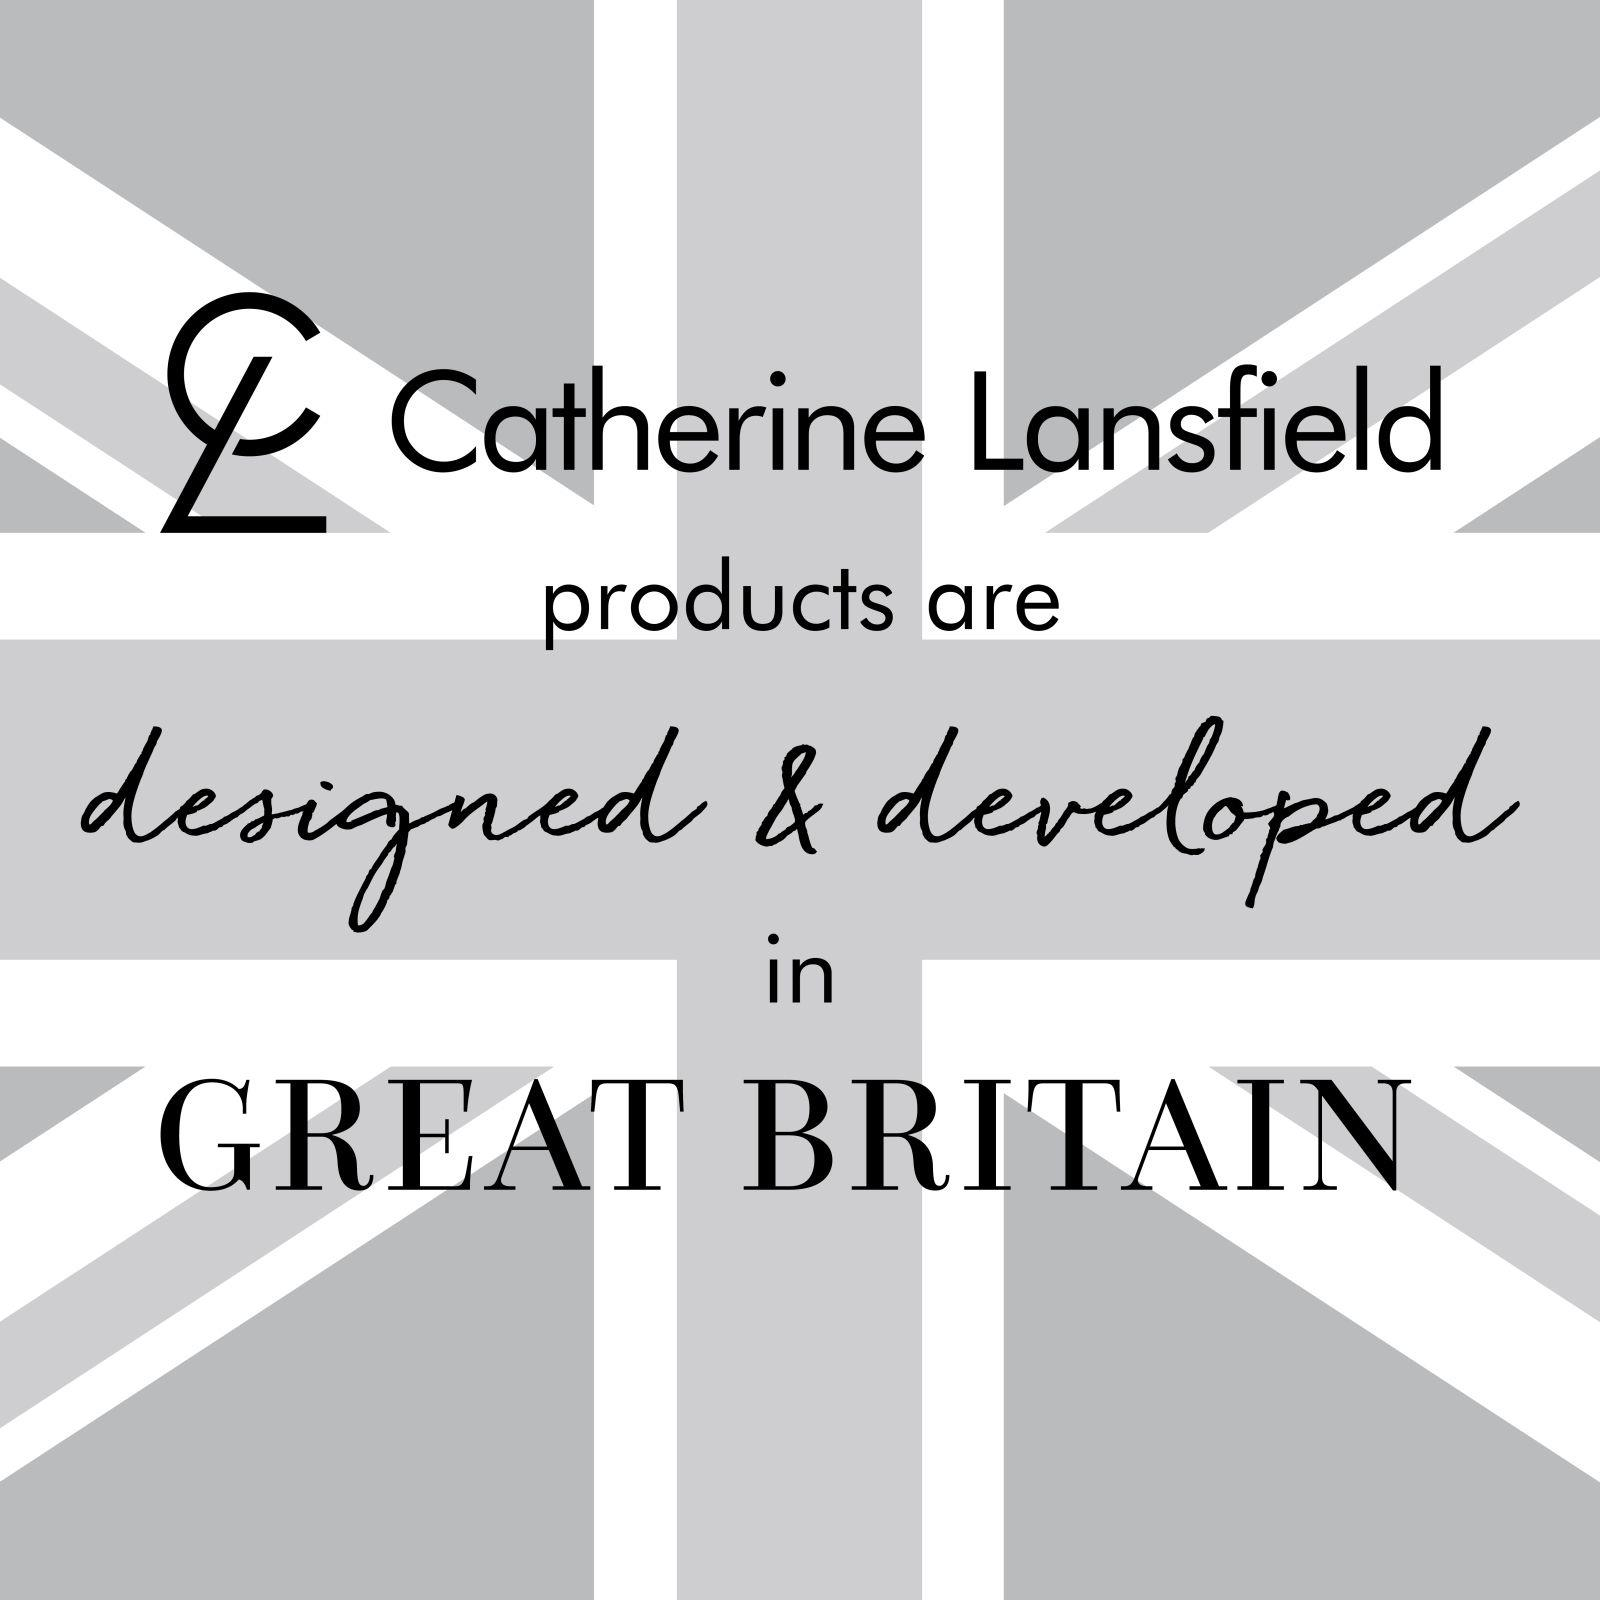 Catherine-Lansfield-Salisbury-Pink-cubierta-del-edredon-edredon-cubre-floral-de-conjuntos-de-cama miniatura 22